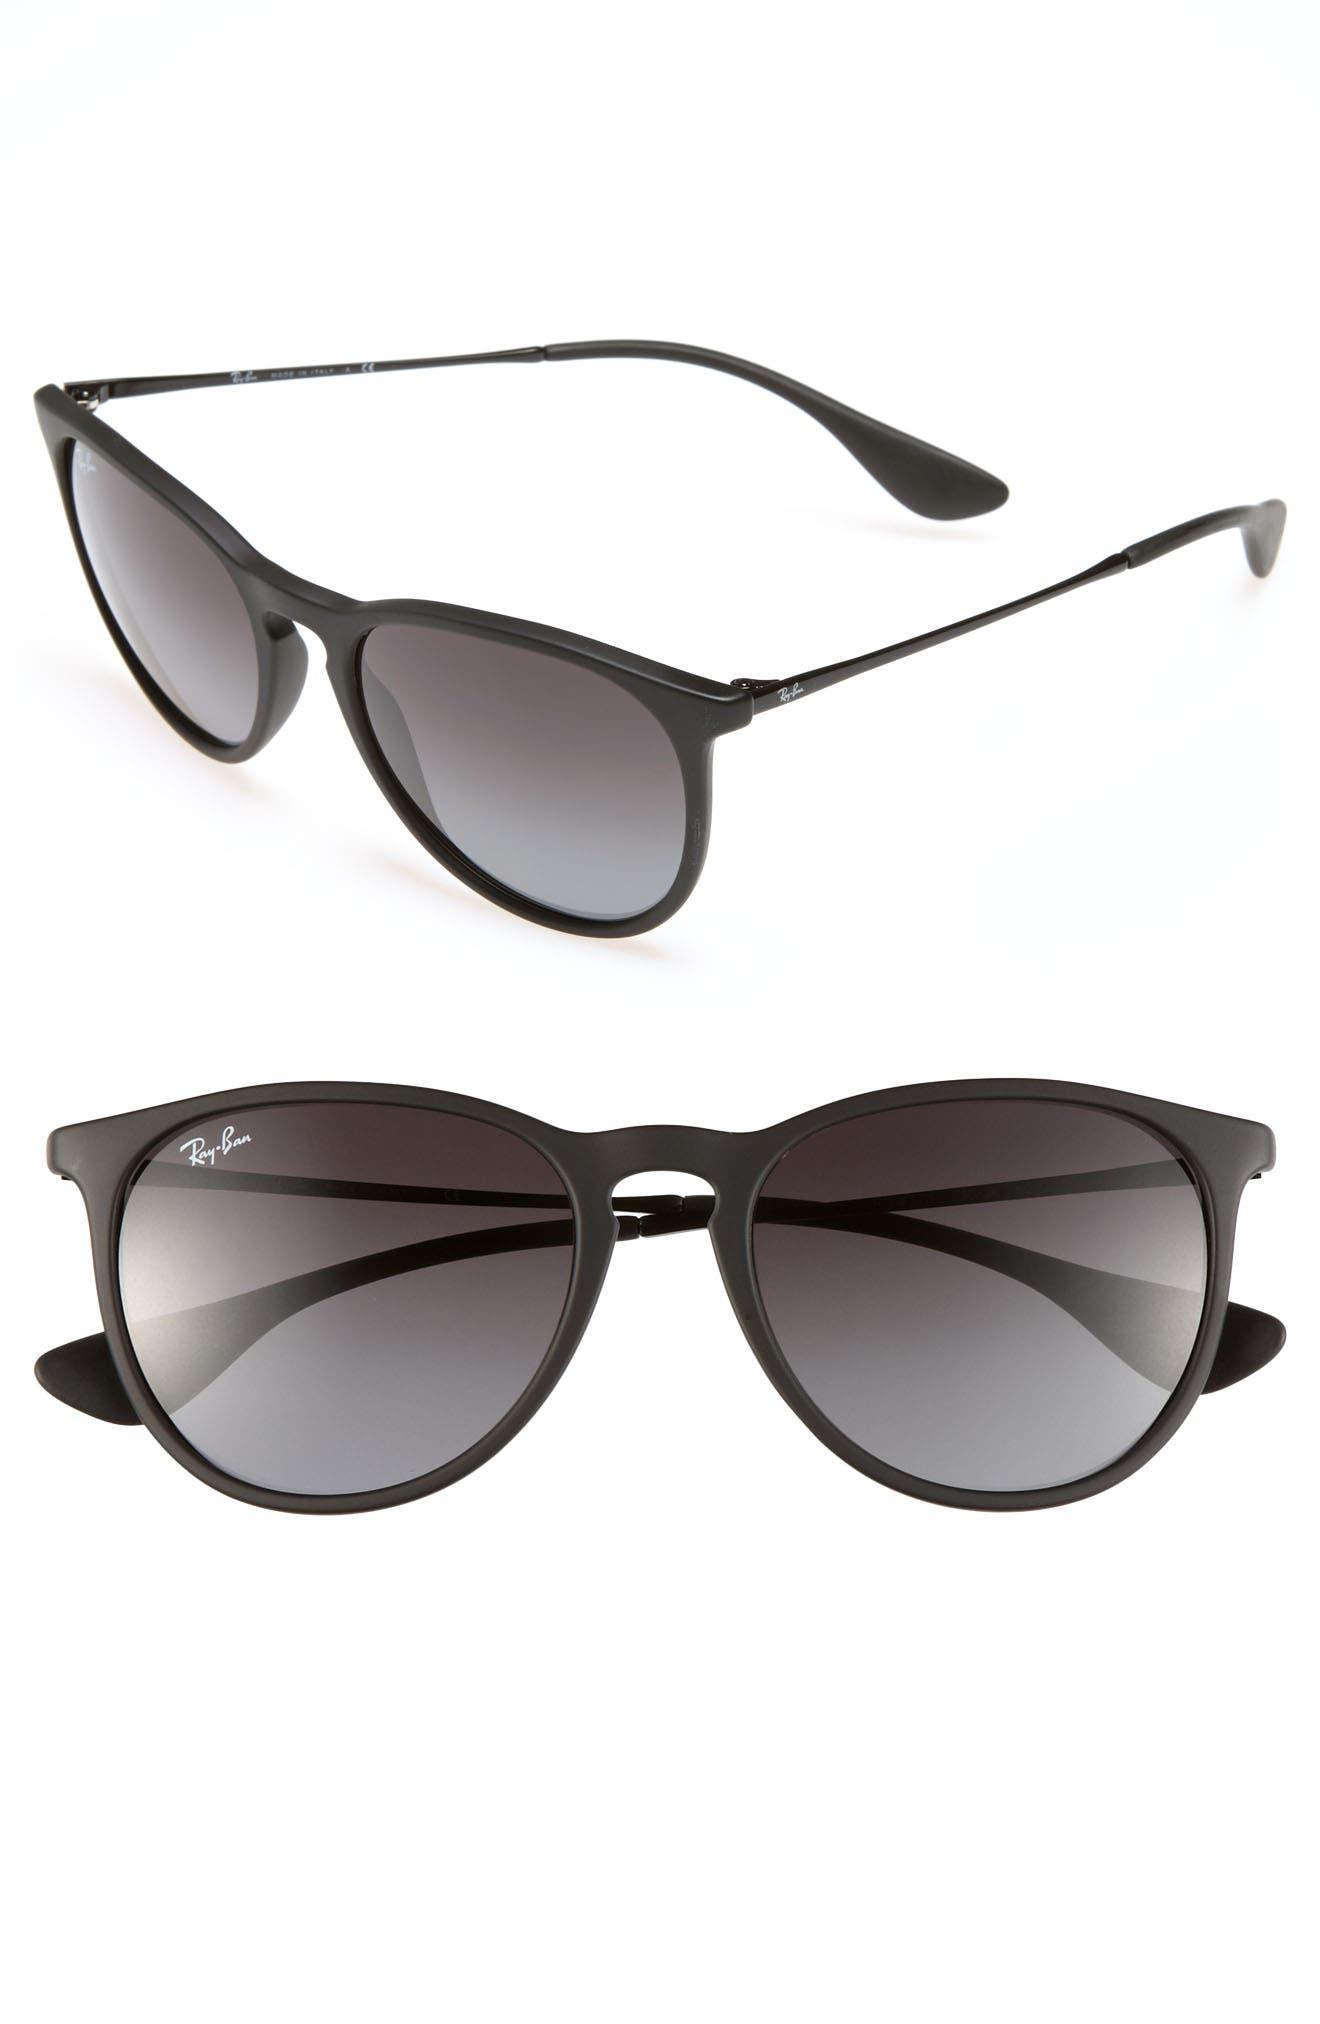 Women's Ray-Ban Erika Classic 54mm Sunglasses - Matte Blue